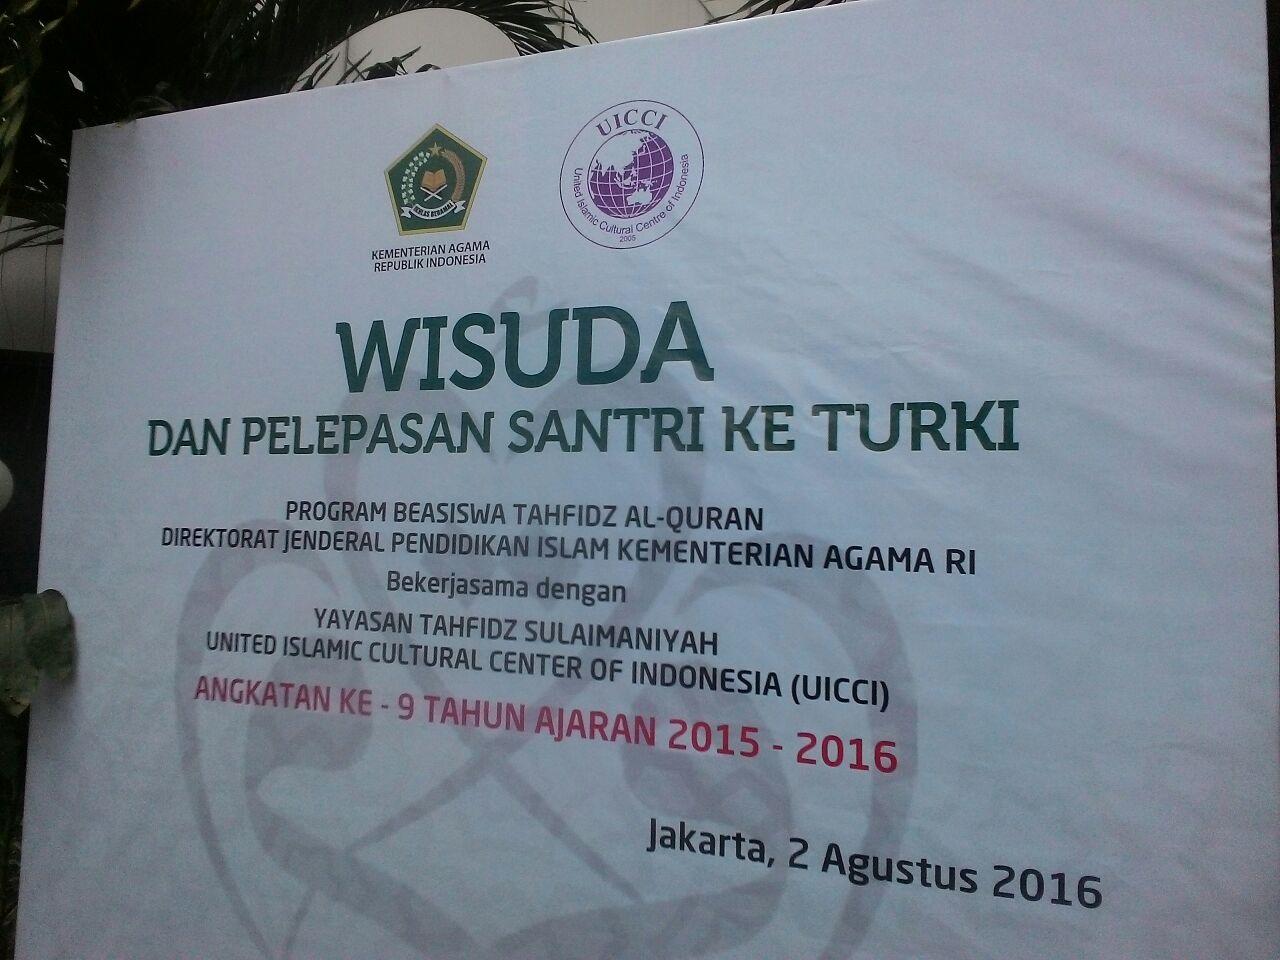 Sebanyak 173 Santri Hafal Al-Quran Dapat Beasiswa ke Turki